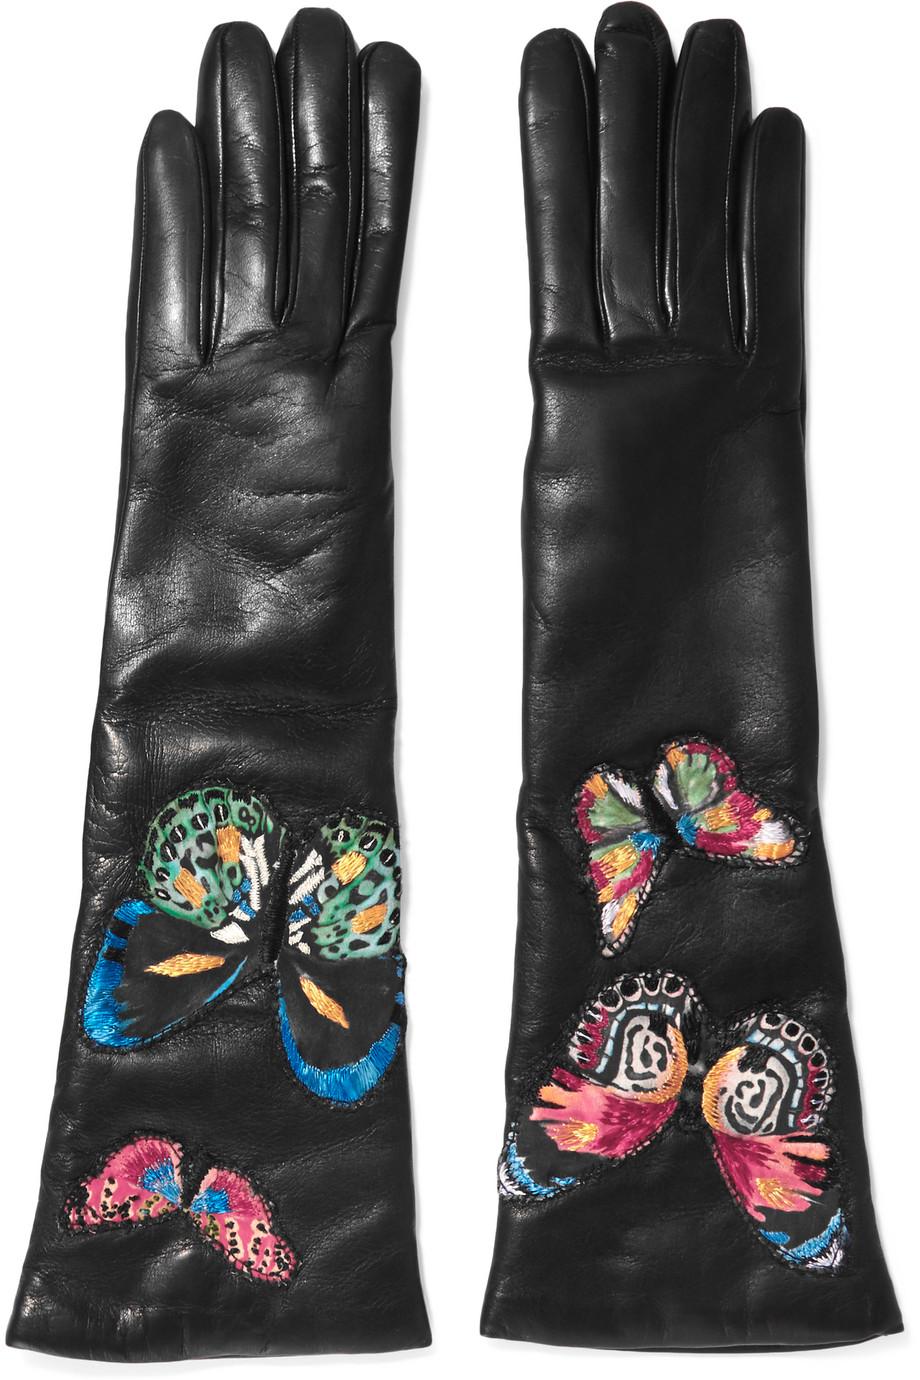 Valentino Butterfly-Appliquéd Leather Gloves, Black, Women's, Size: 8.5